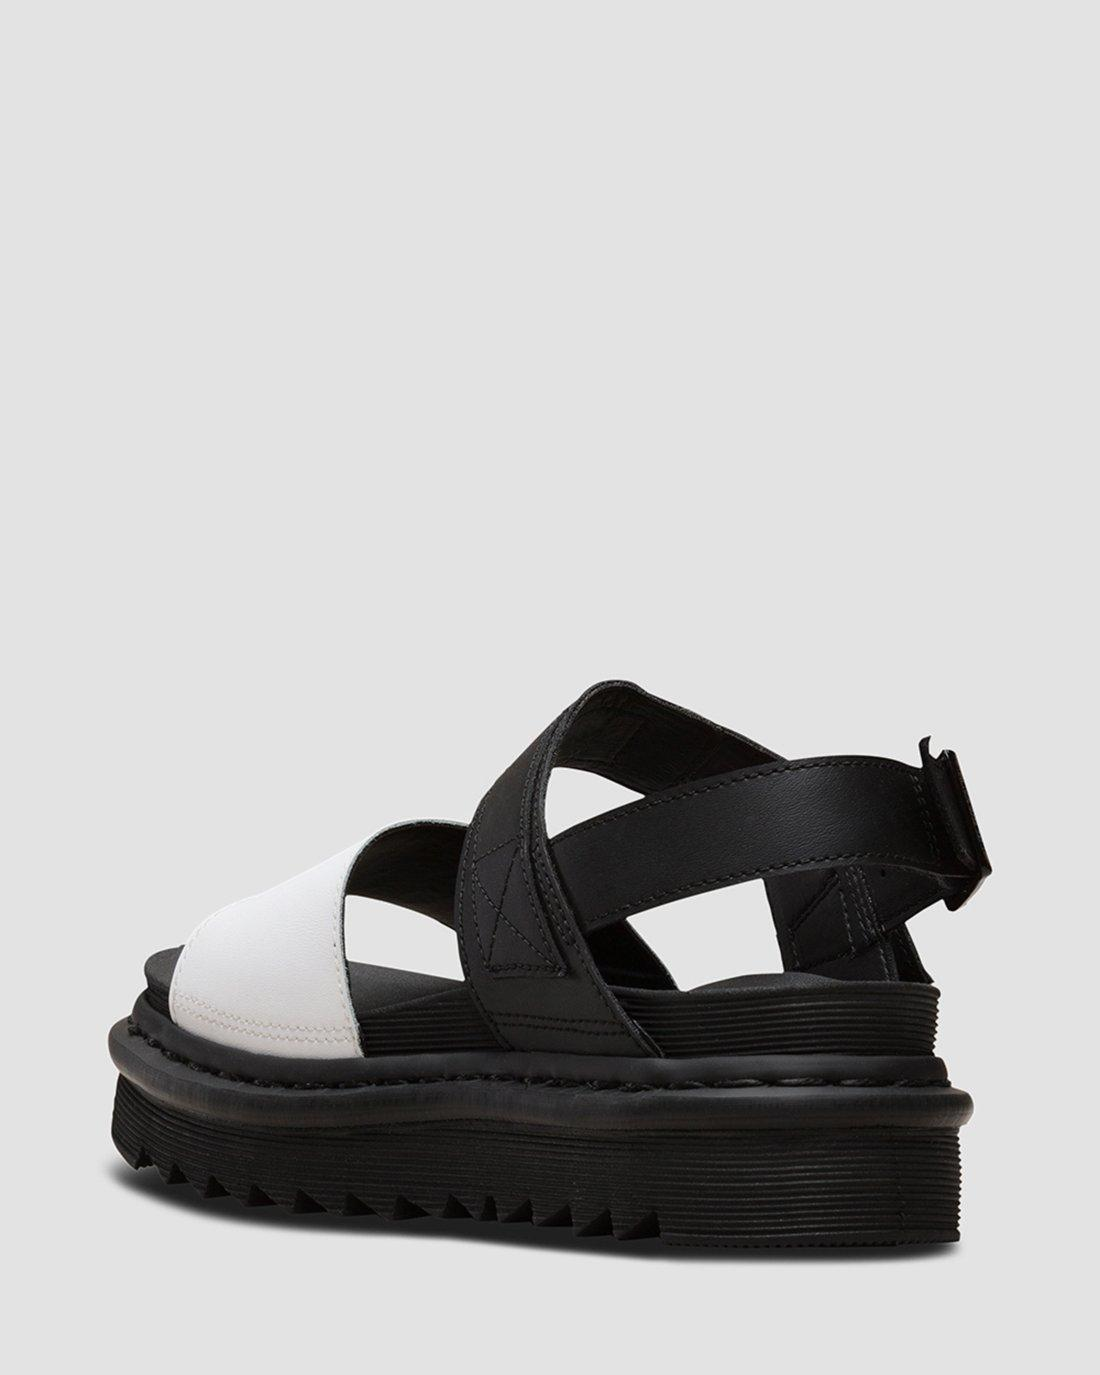 Details about Women's Shoes Dr. Martens VOSS Casual Leather Sandals 24628009 BLACK WHITE